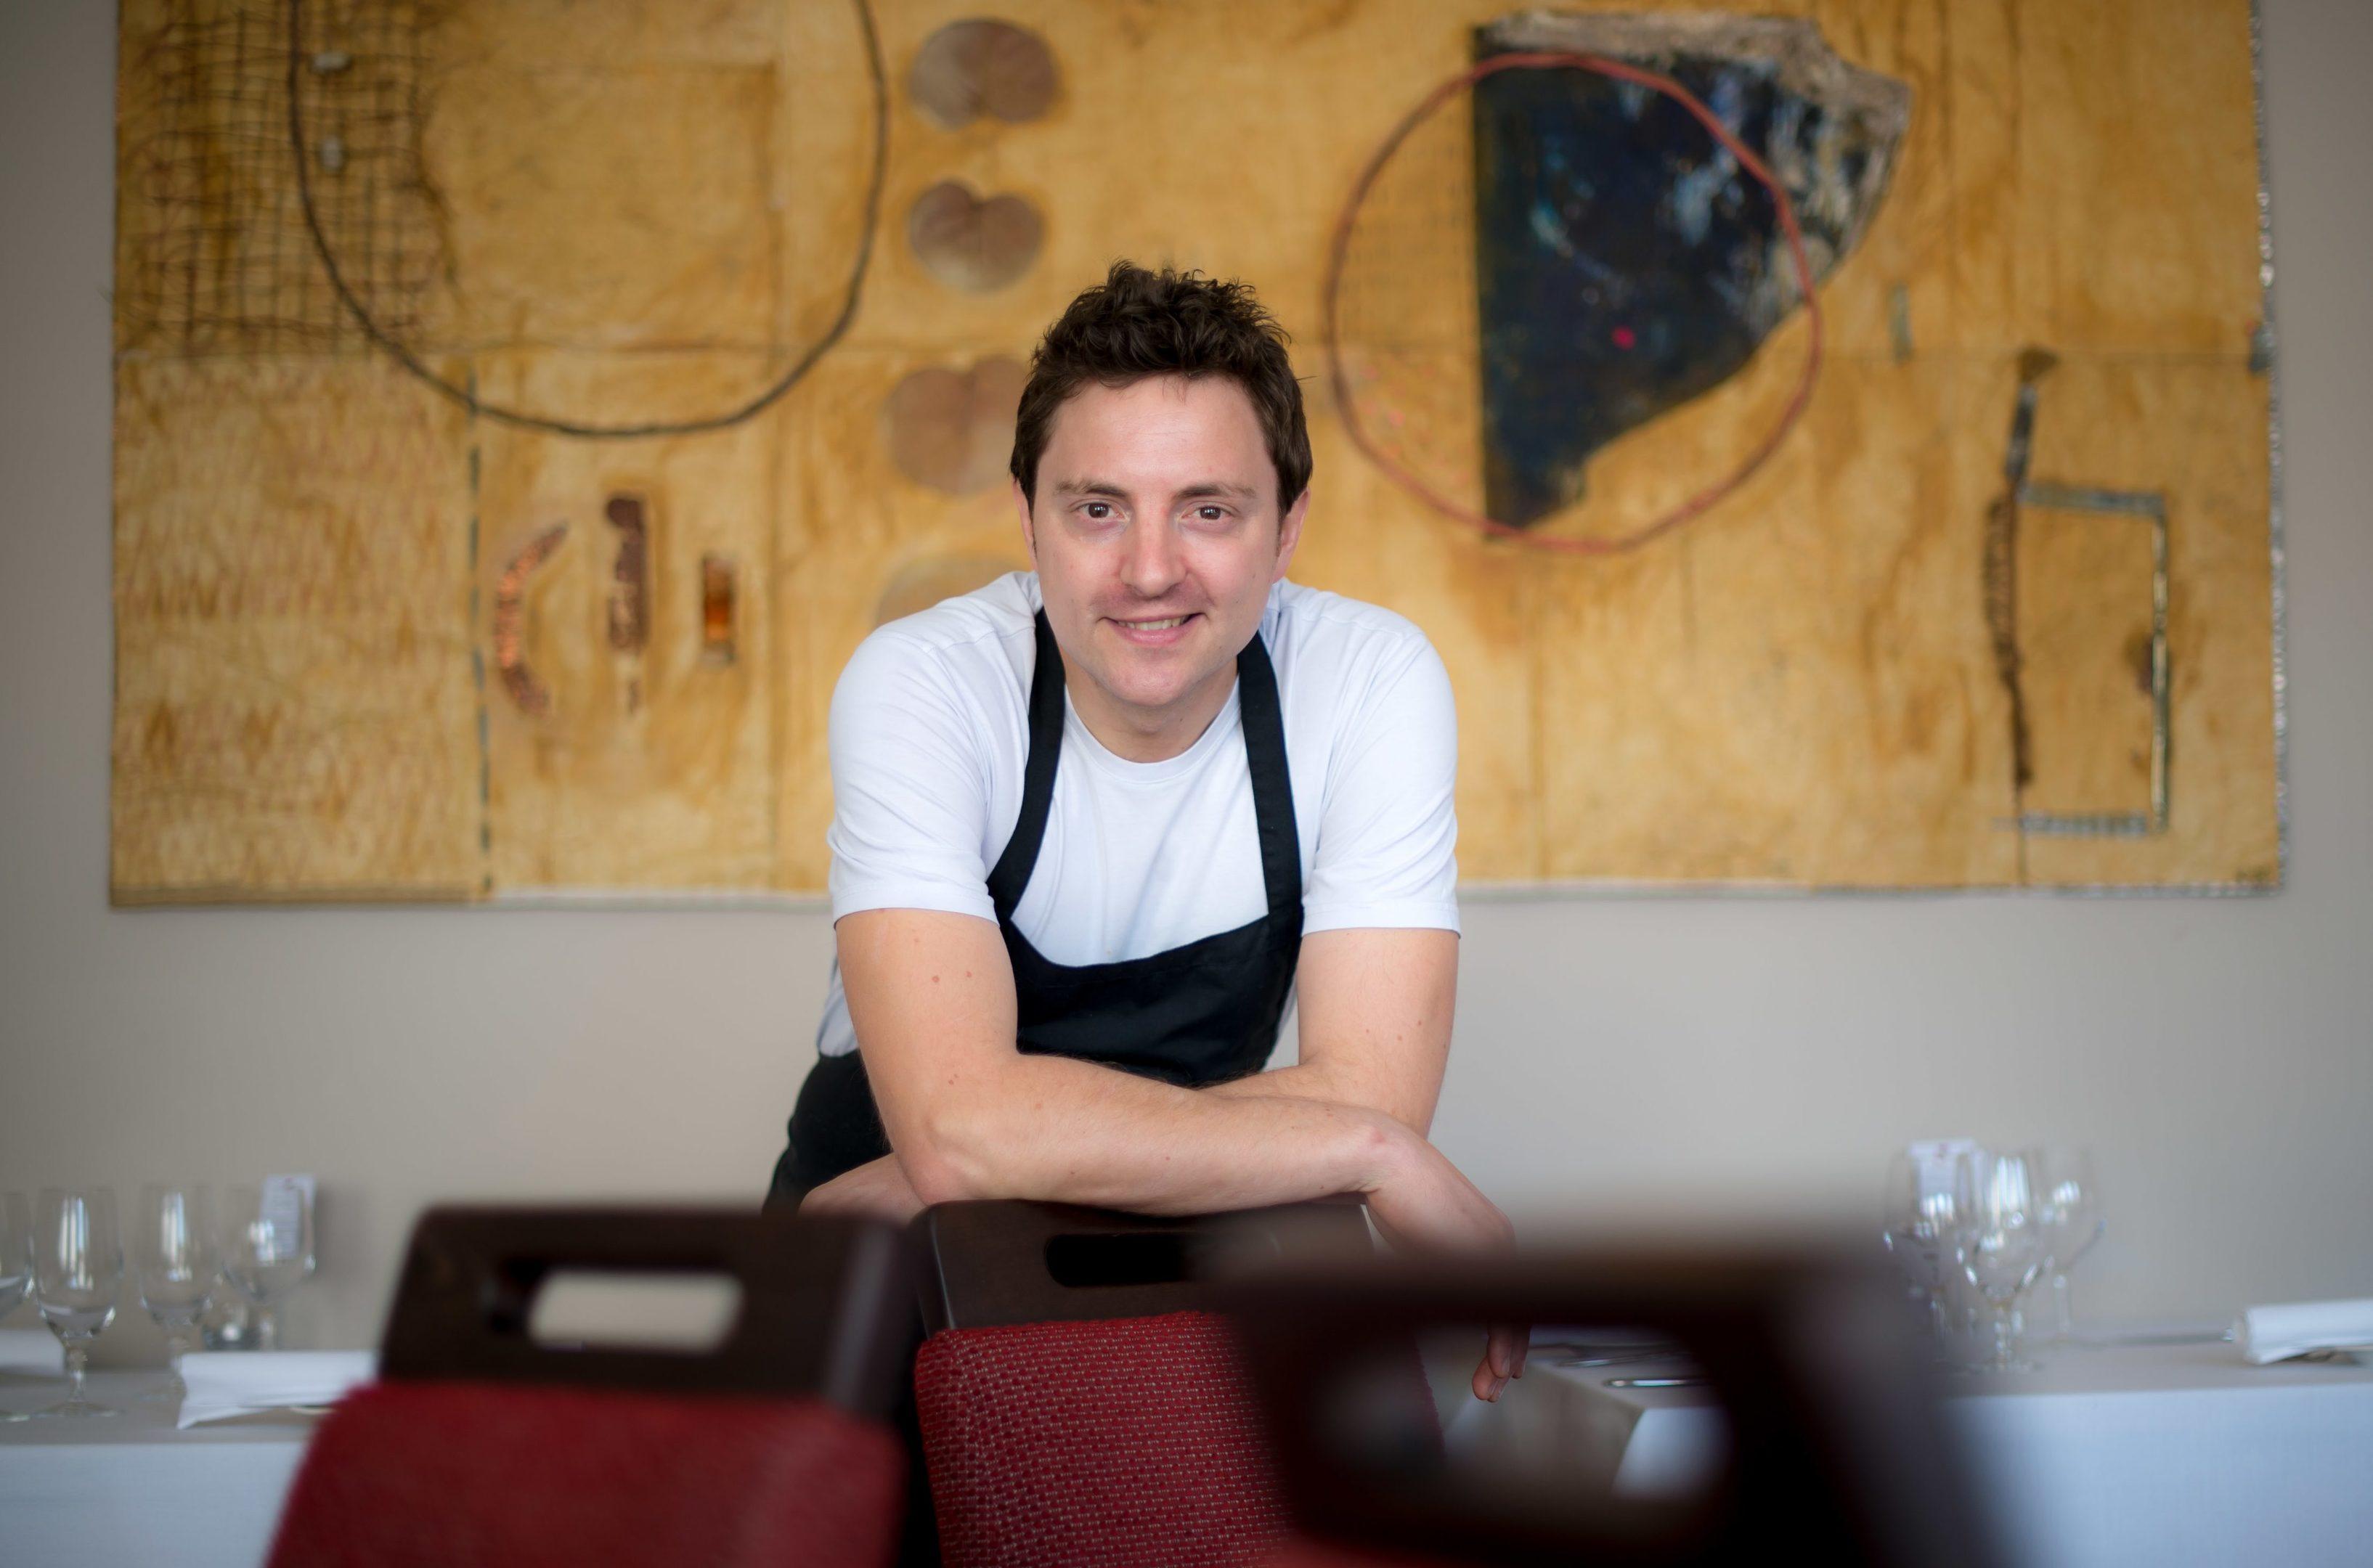 Chef Graeme Pallister of 63 Tay Street